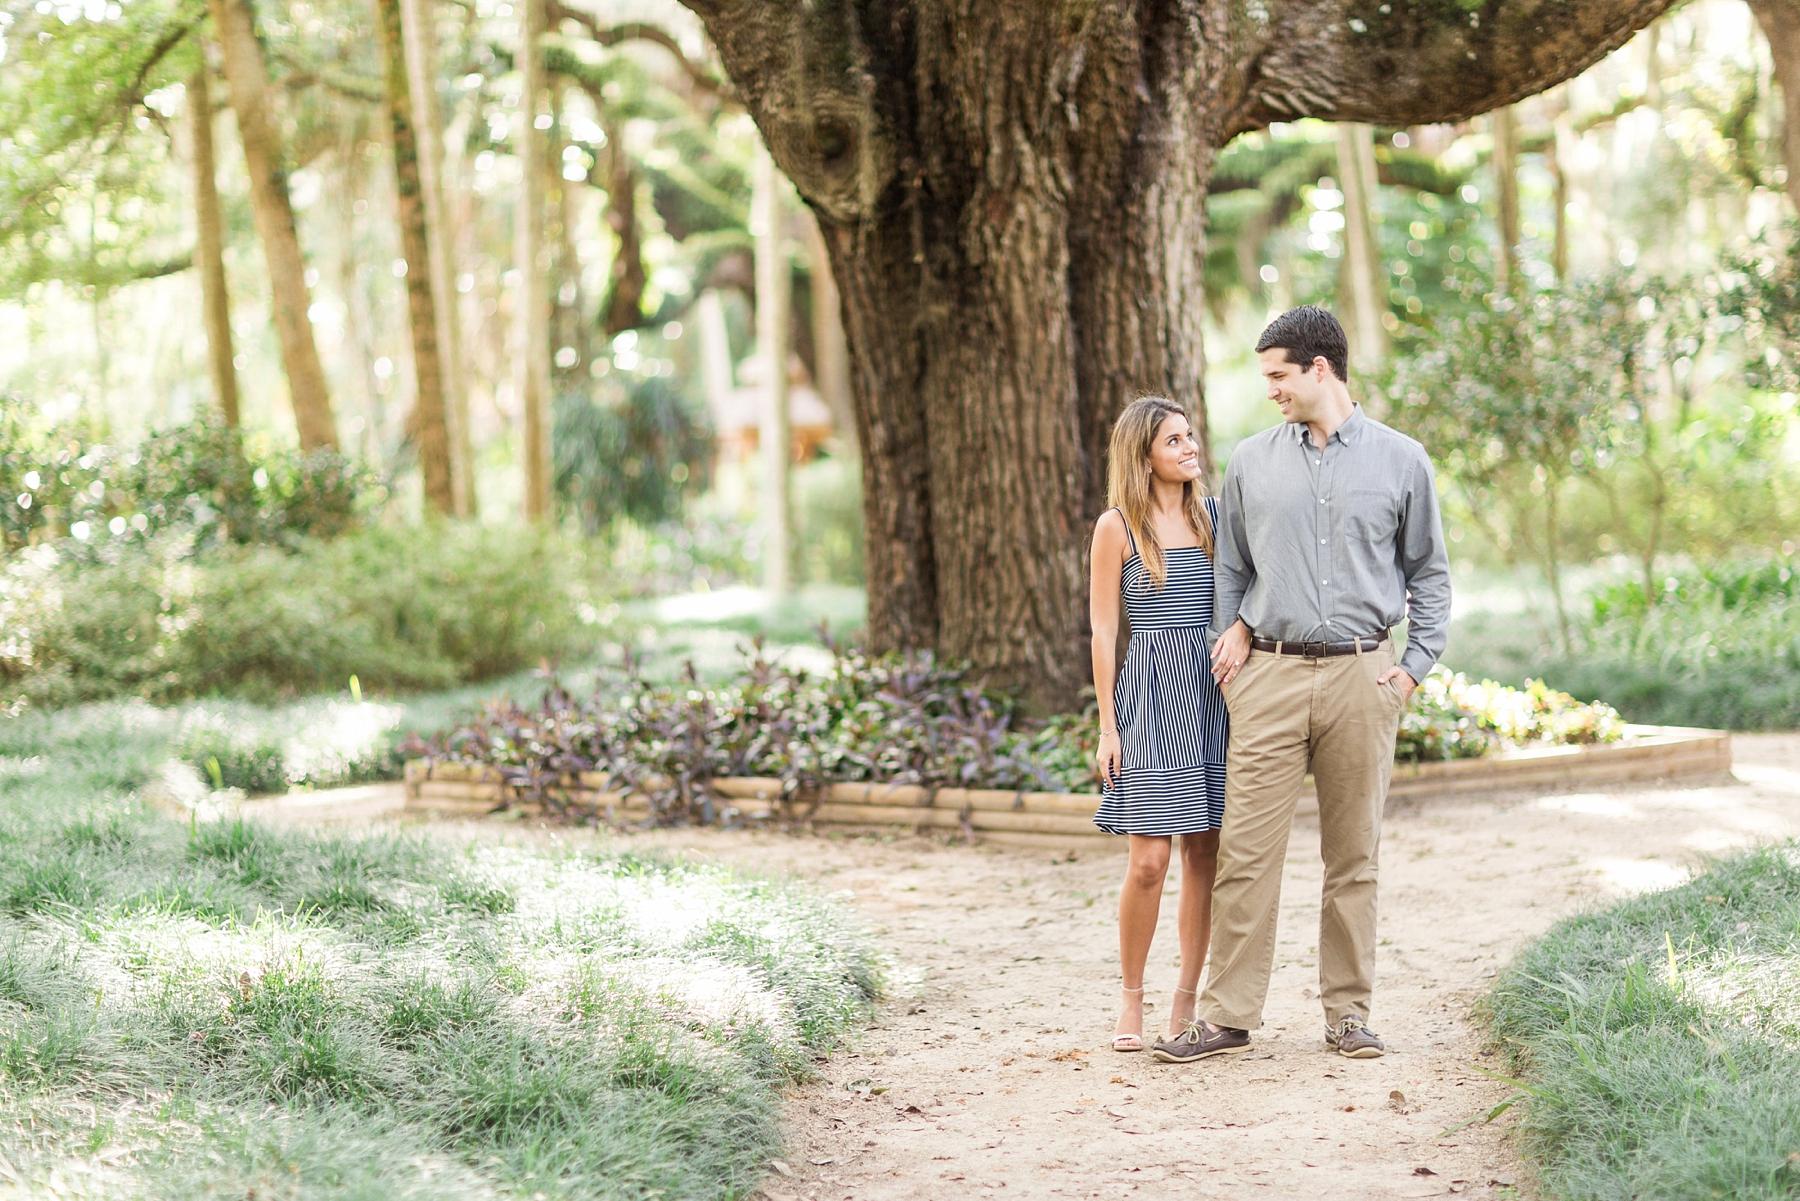 Washington Oaks Gardens Engagement Bri Cibene Photographybri Cibene Photography